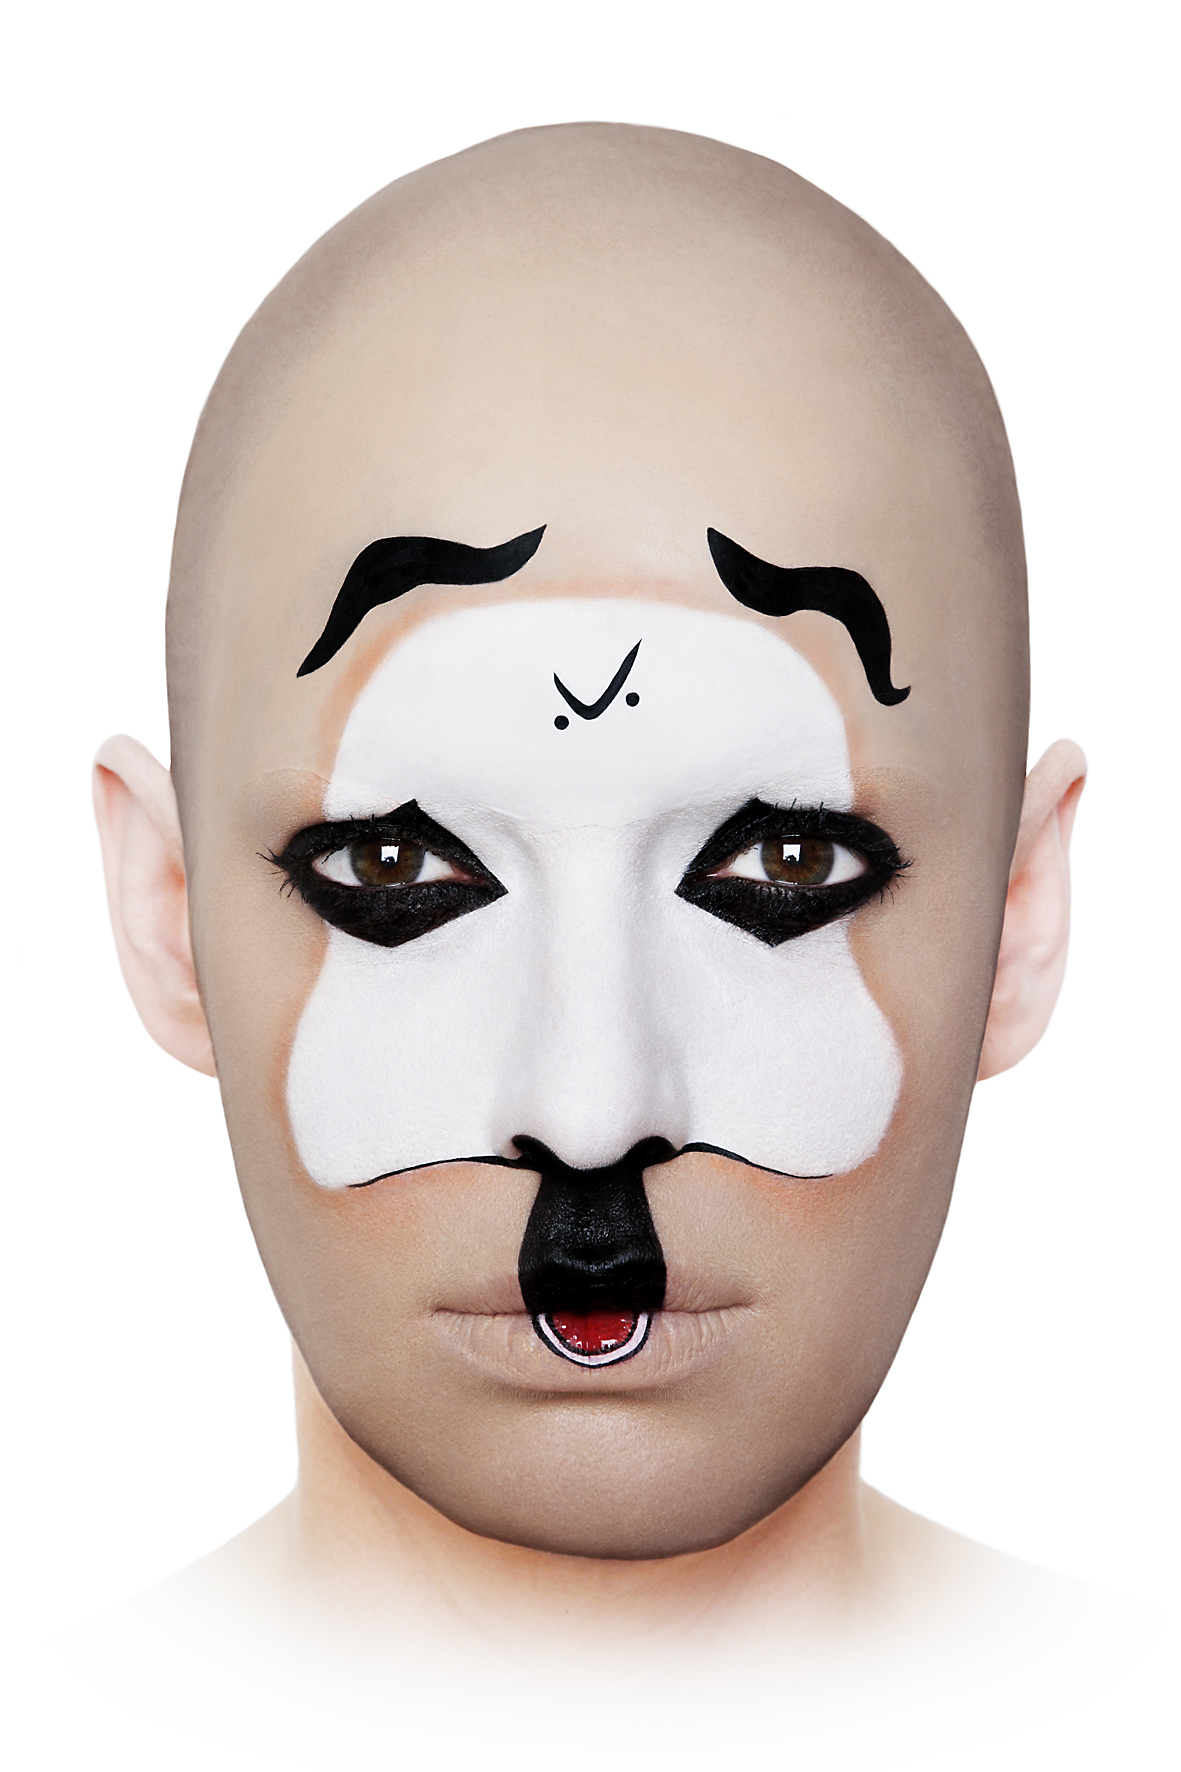 Geiles Globales Gesicht # 10  , 2008, self-portrait, lambda print, 80 cm x 120 cm.